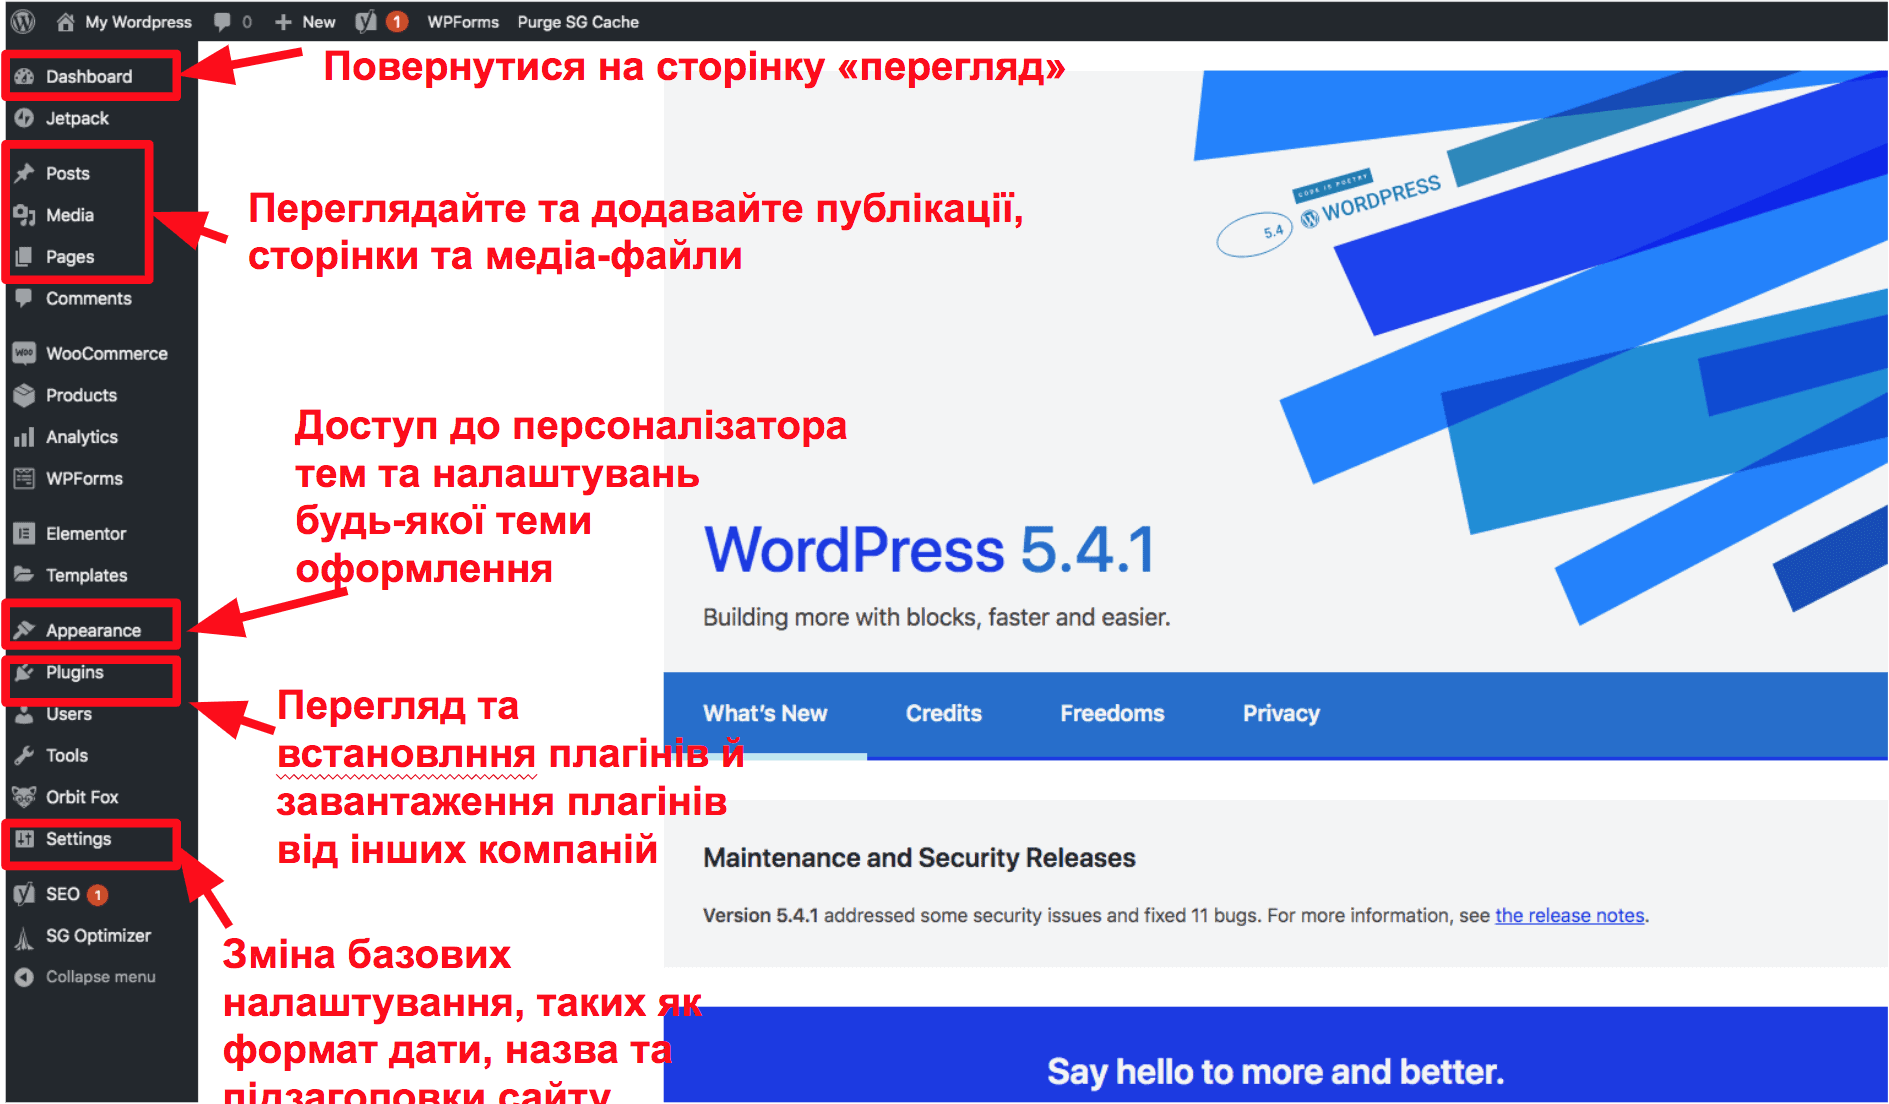 The WordPress dashboard UK16